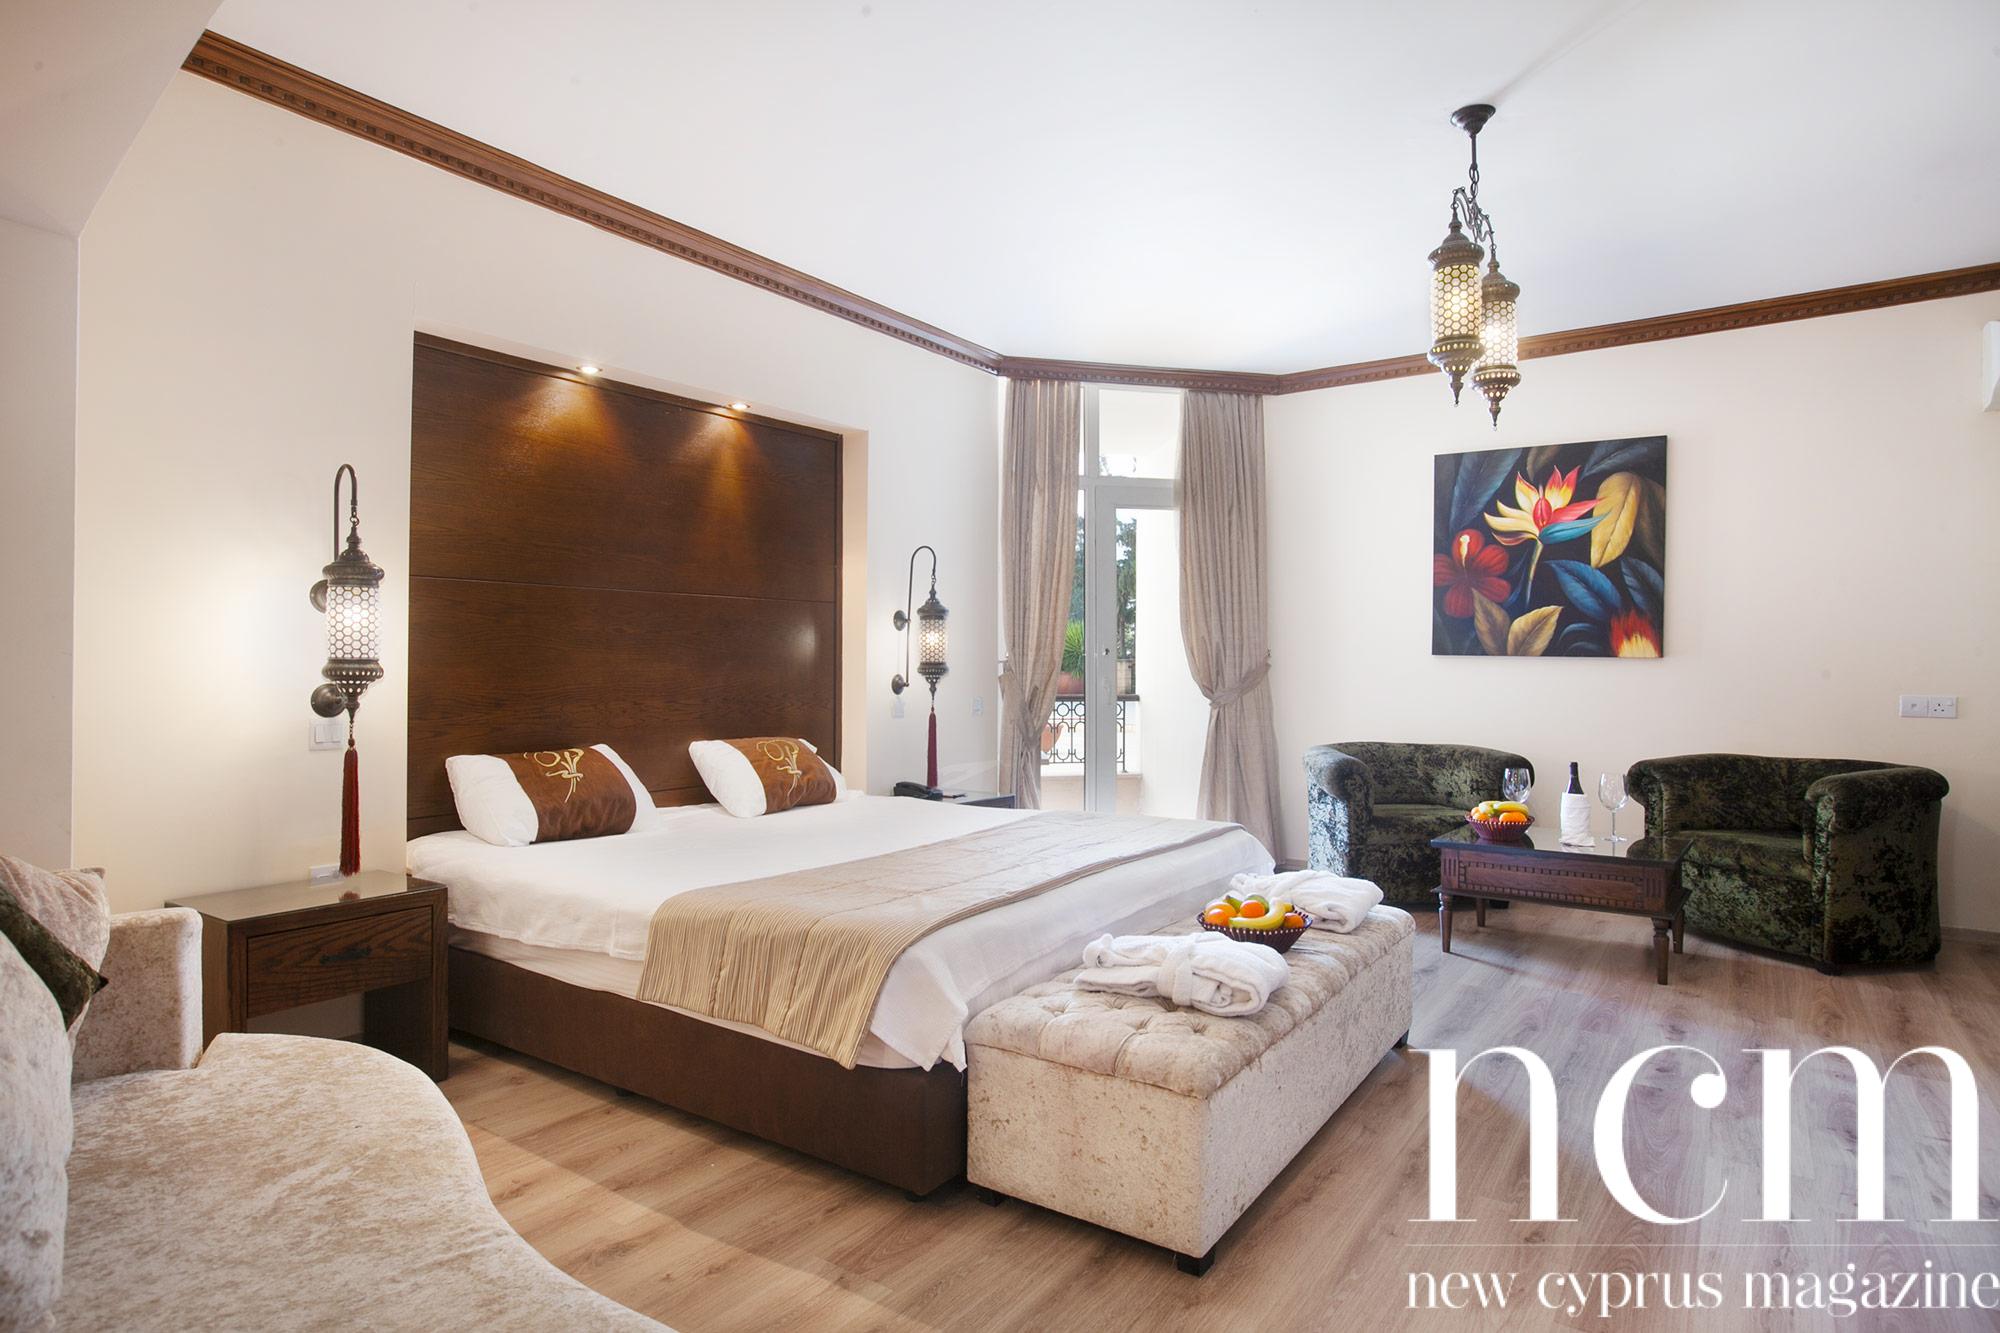 Hotel Pia Bella in Girne